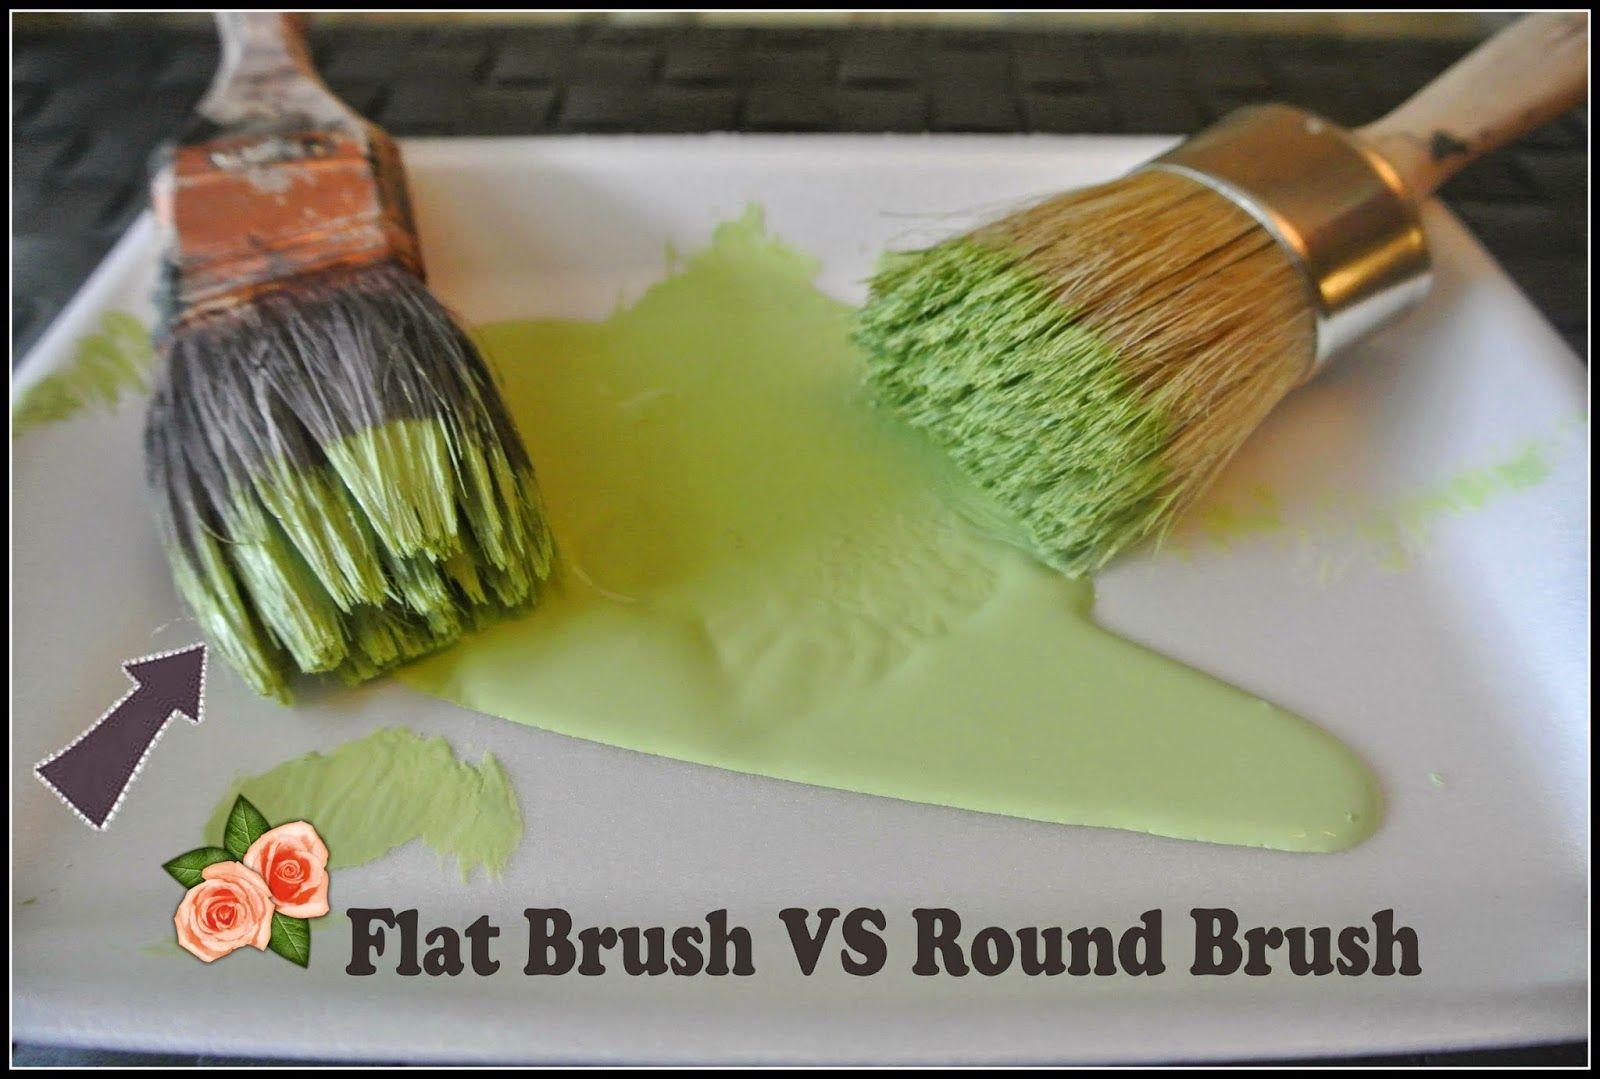 Flat Paint Brush Vs Round Paint Brush If You Want To